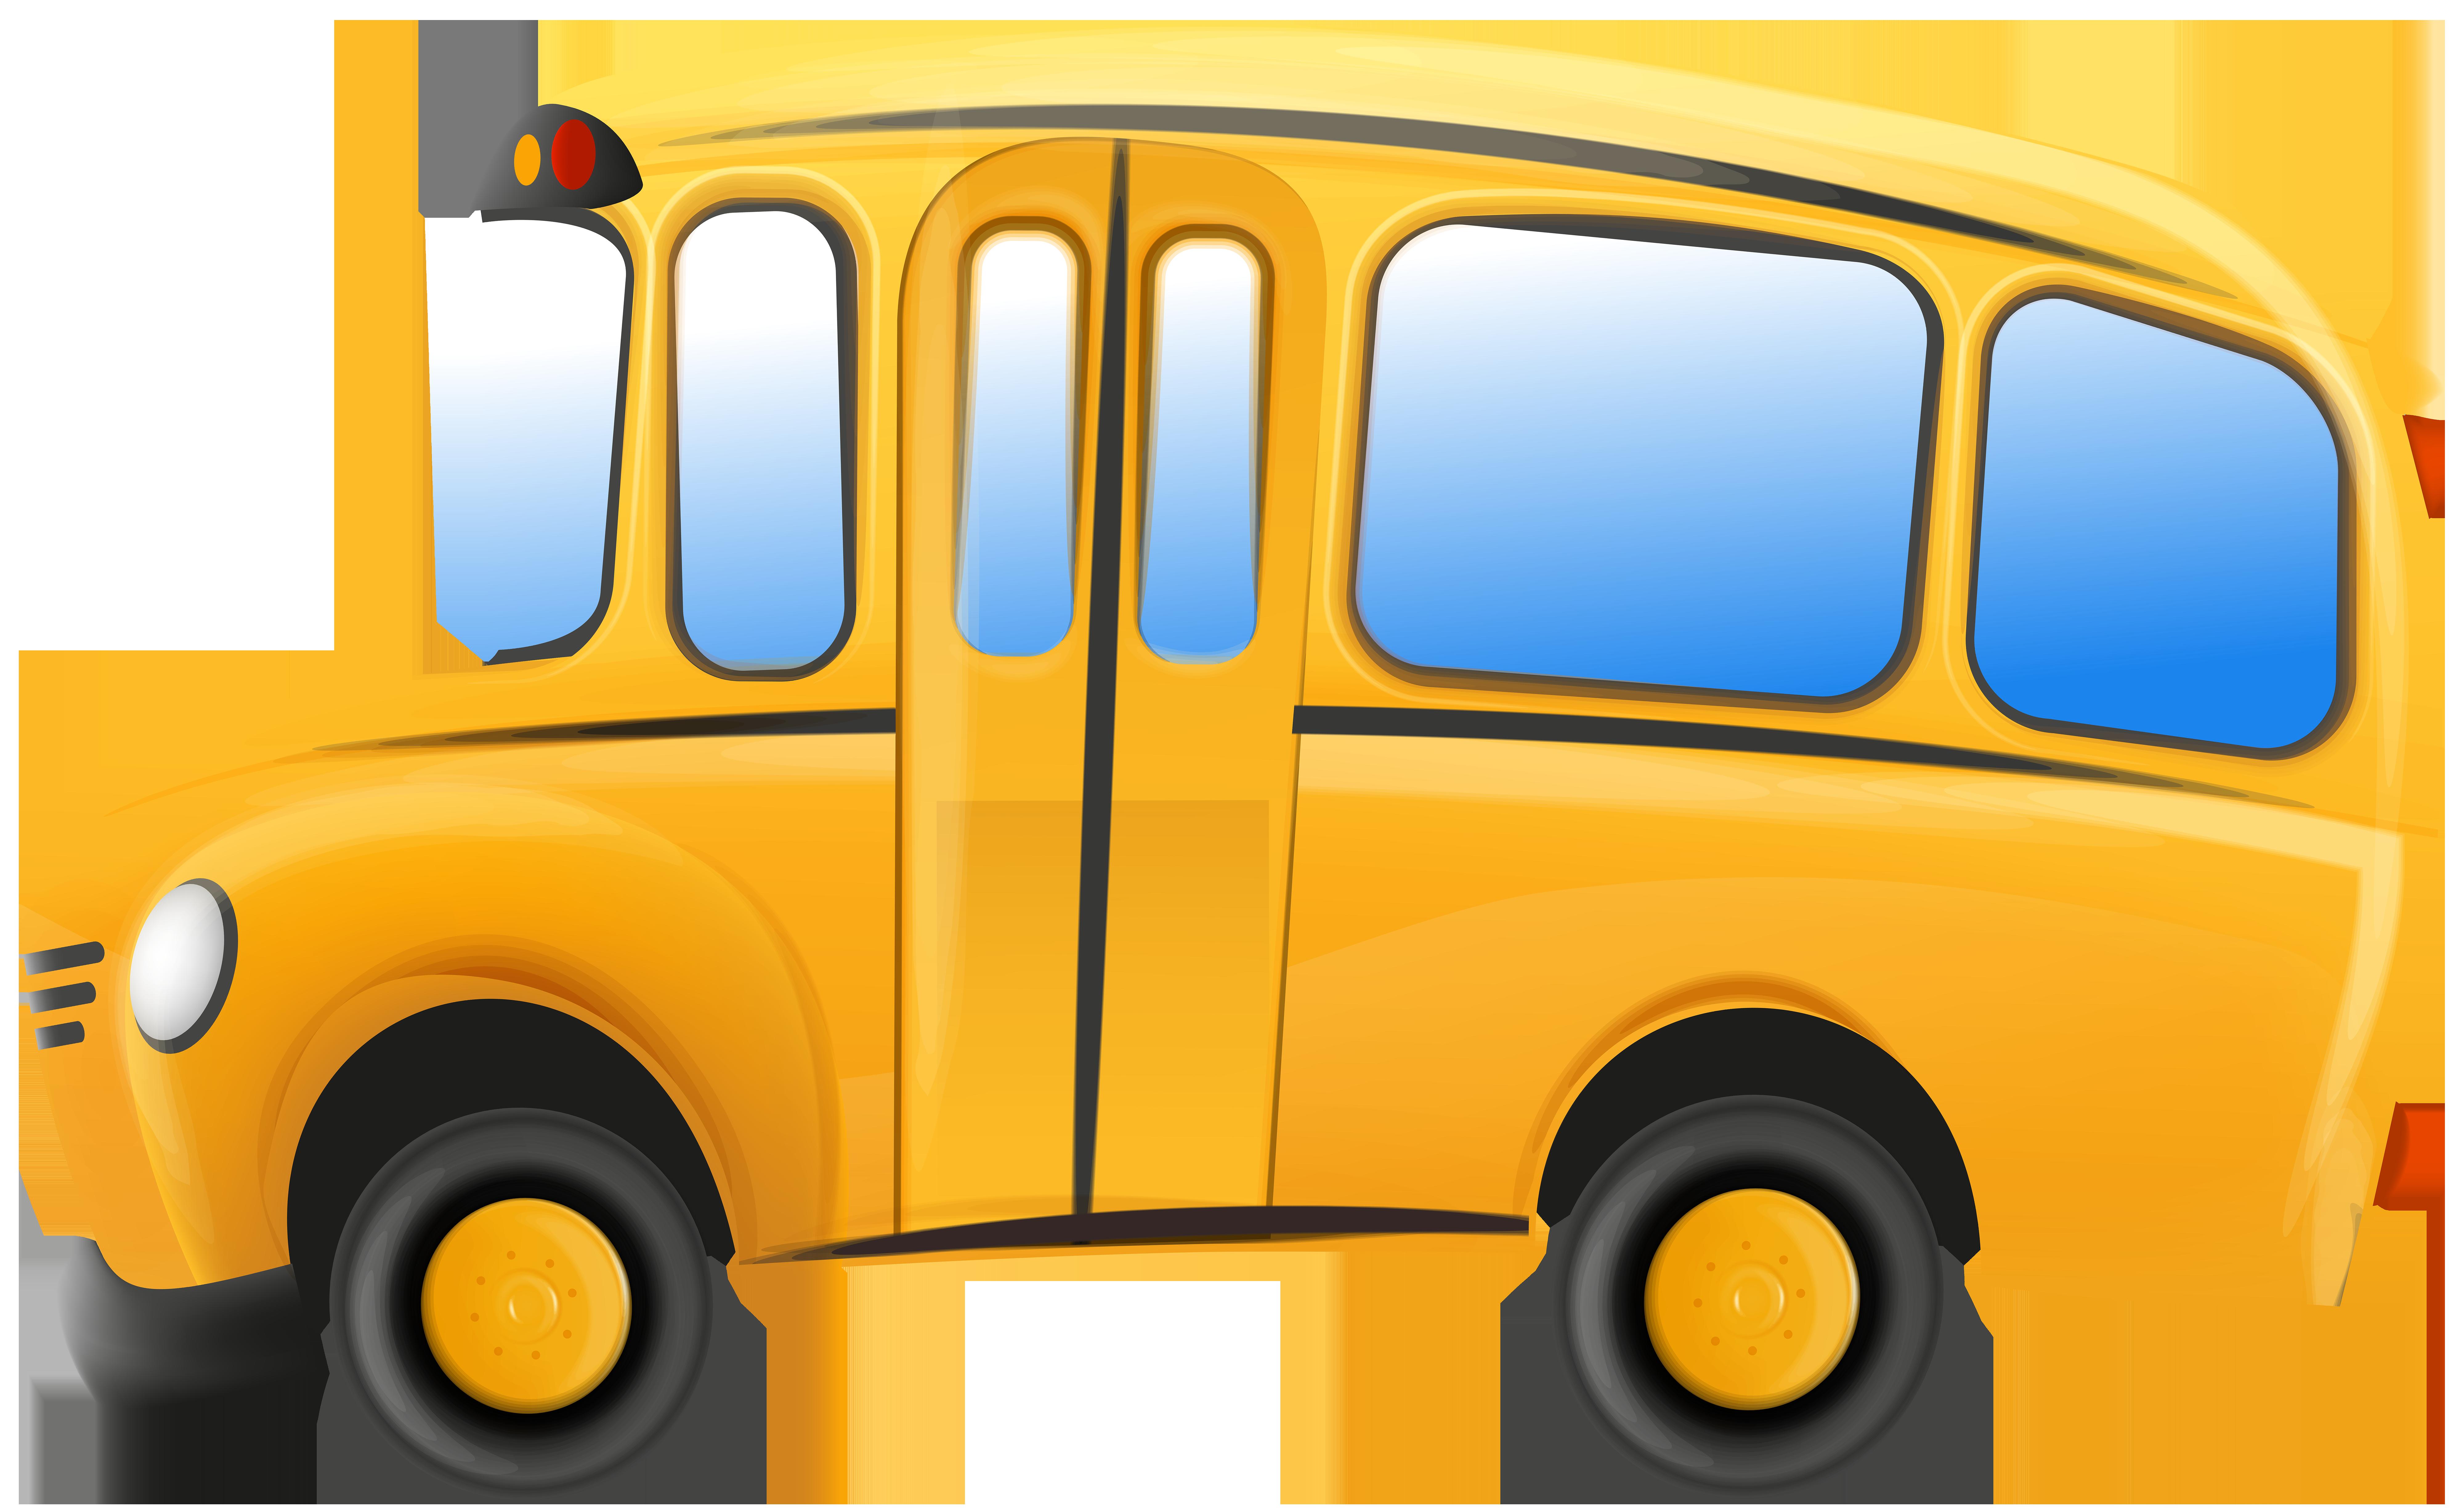 School Bus Transparent Clip Art Image.